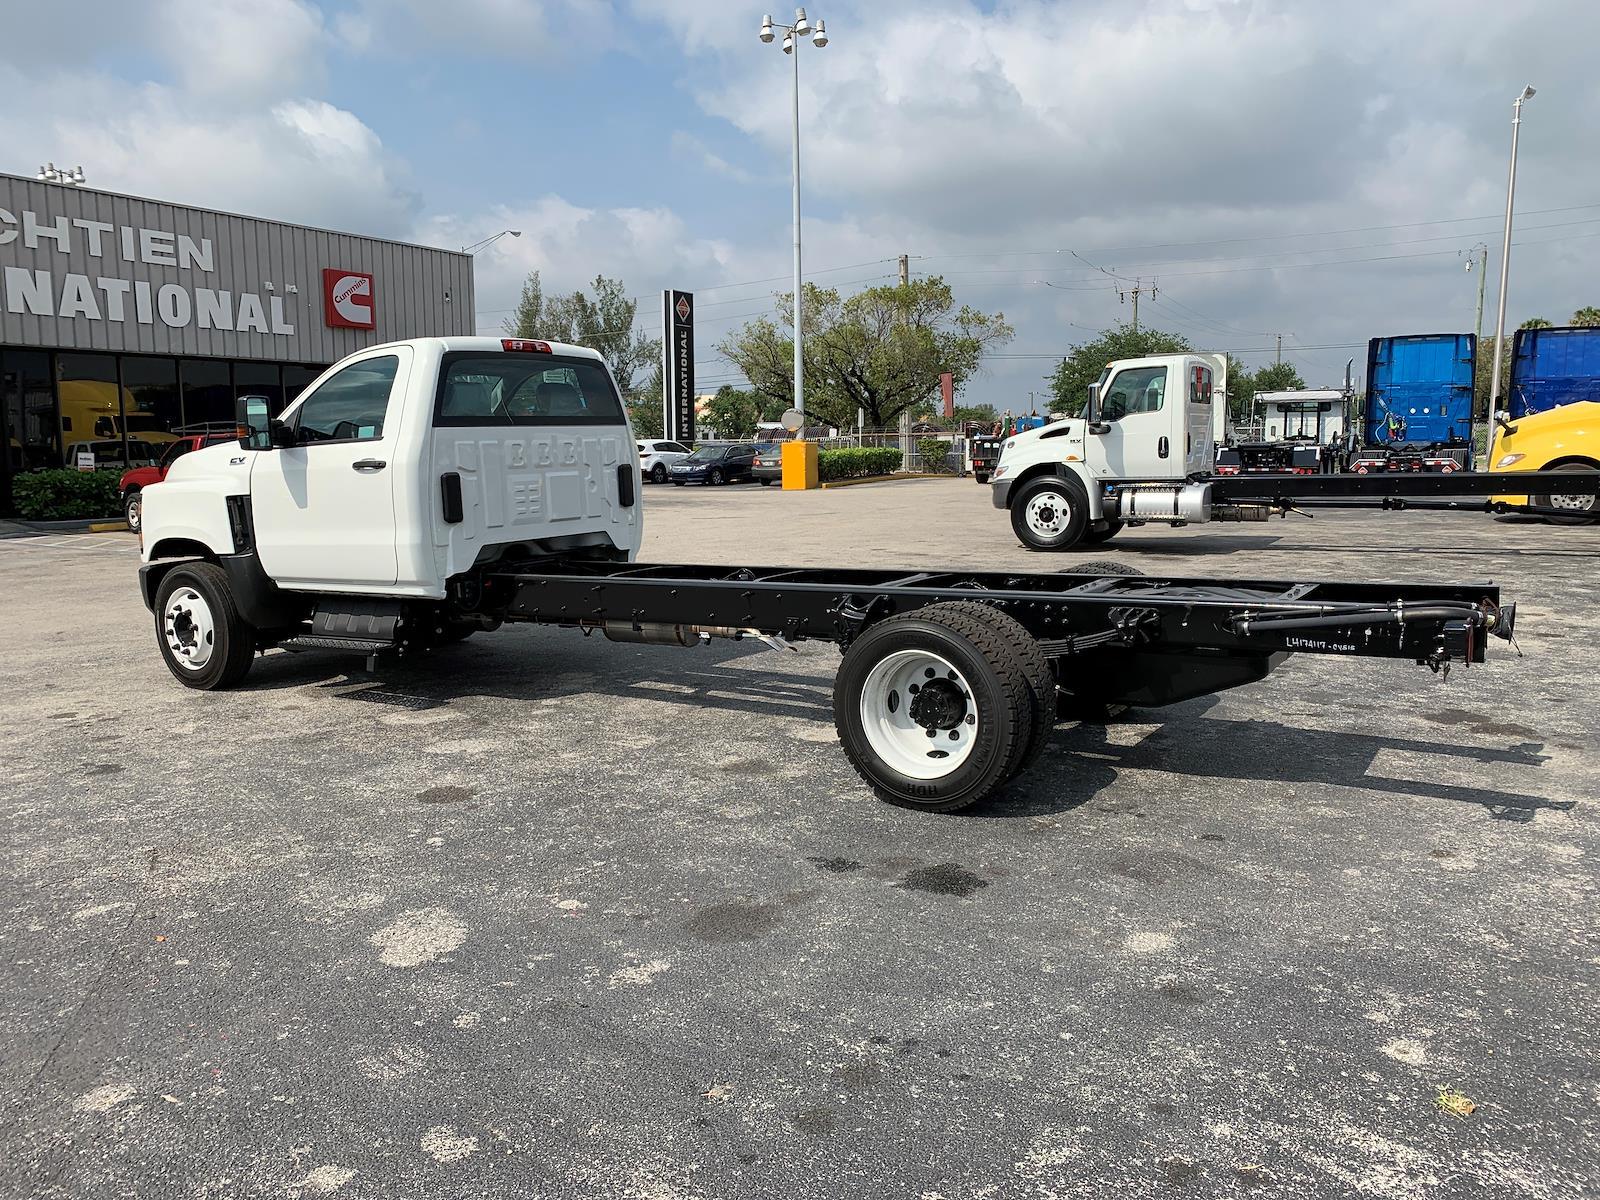 2022 International CV 4x4, Cab Chassis #PR-235447 - photo 1